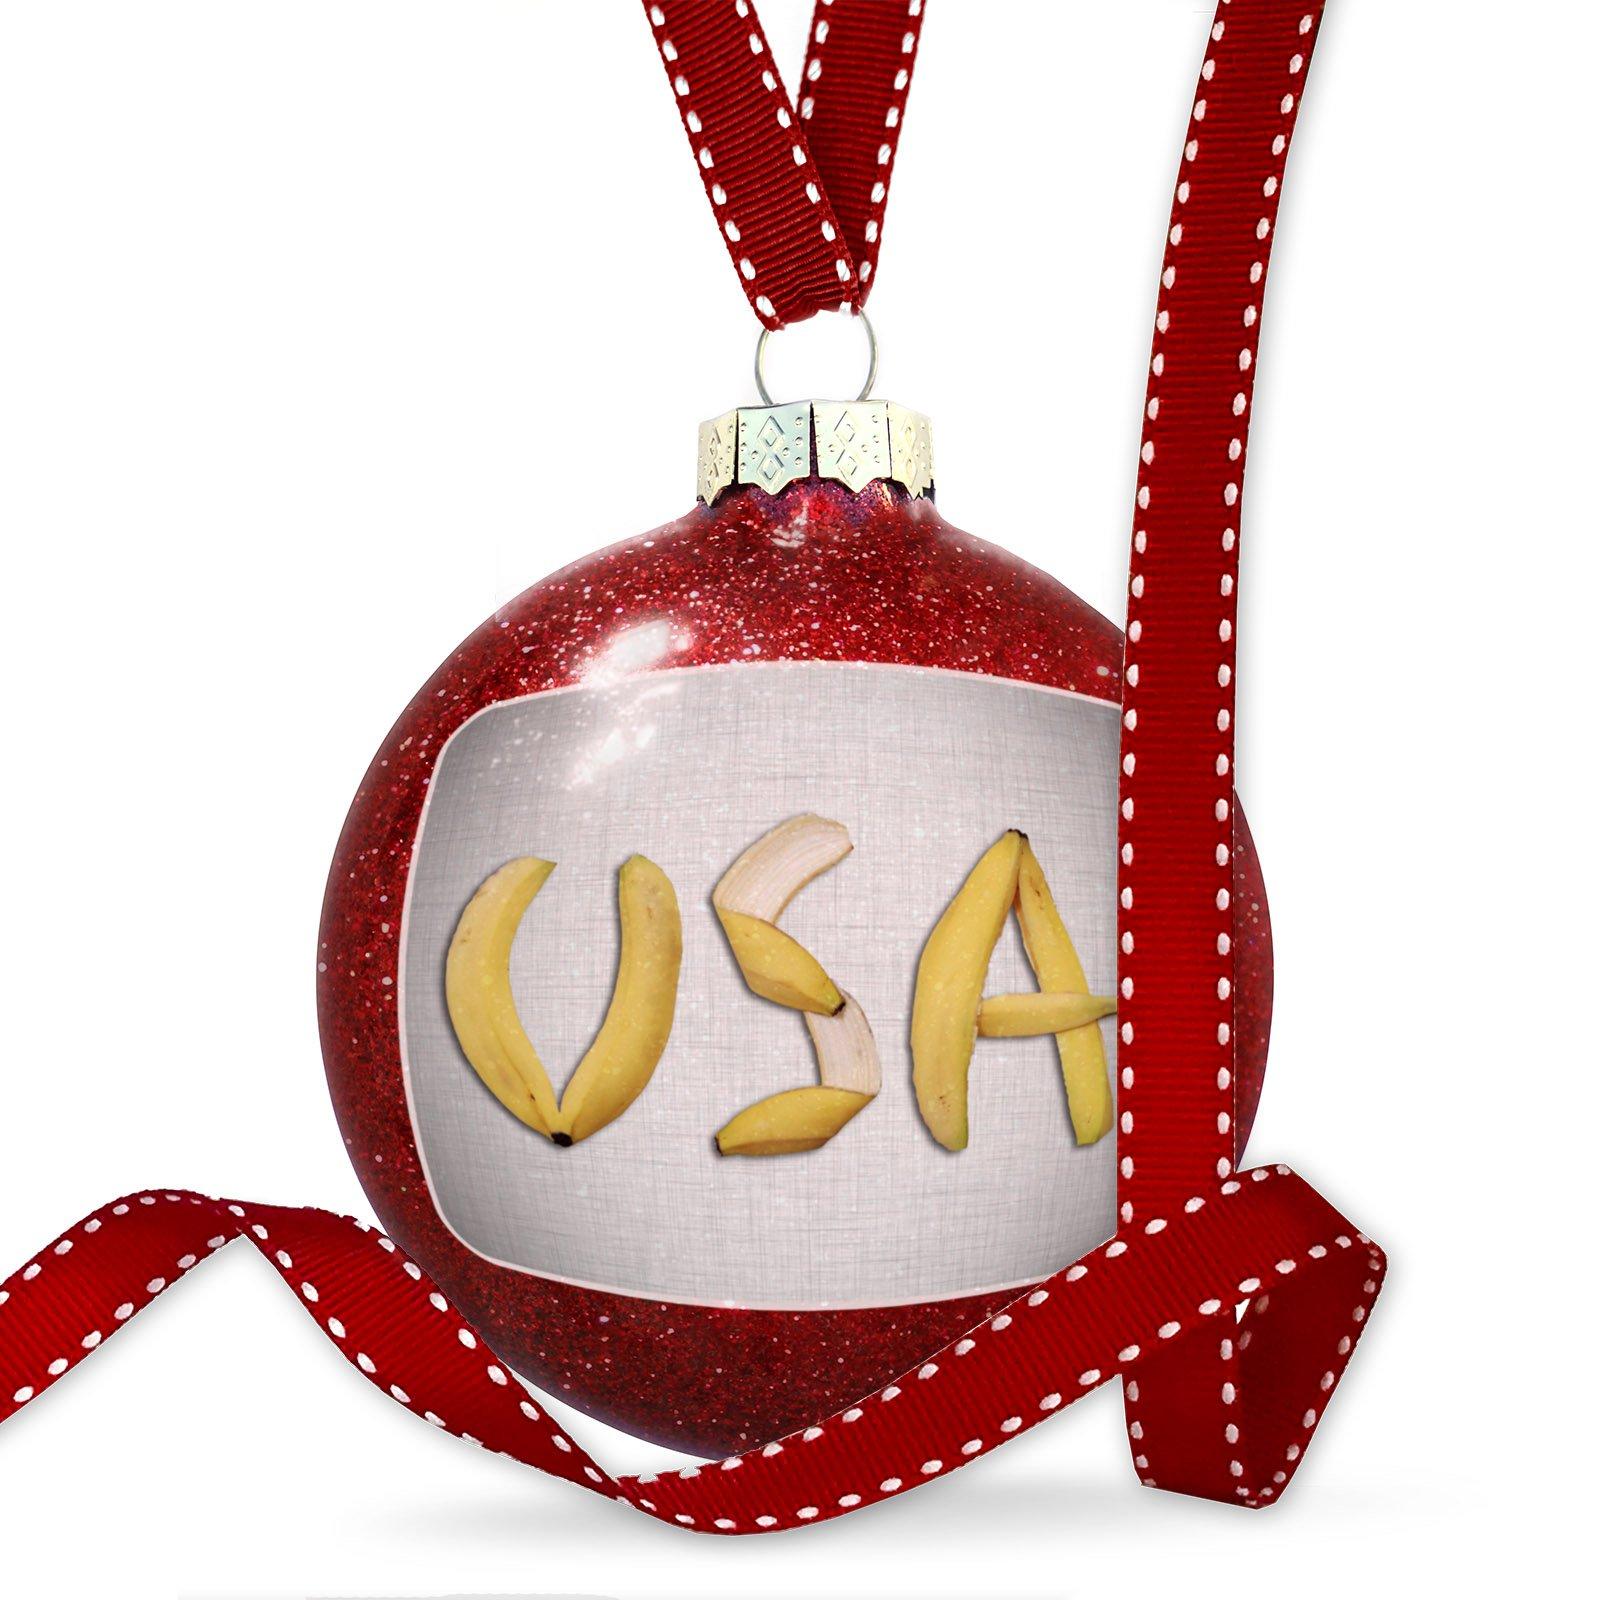 Christmas Decoration United States of America Bananas Ornament